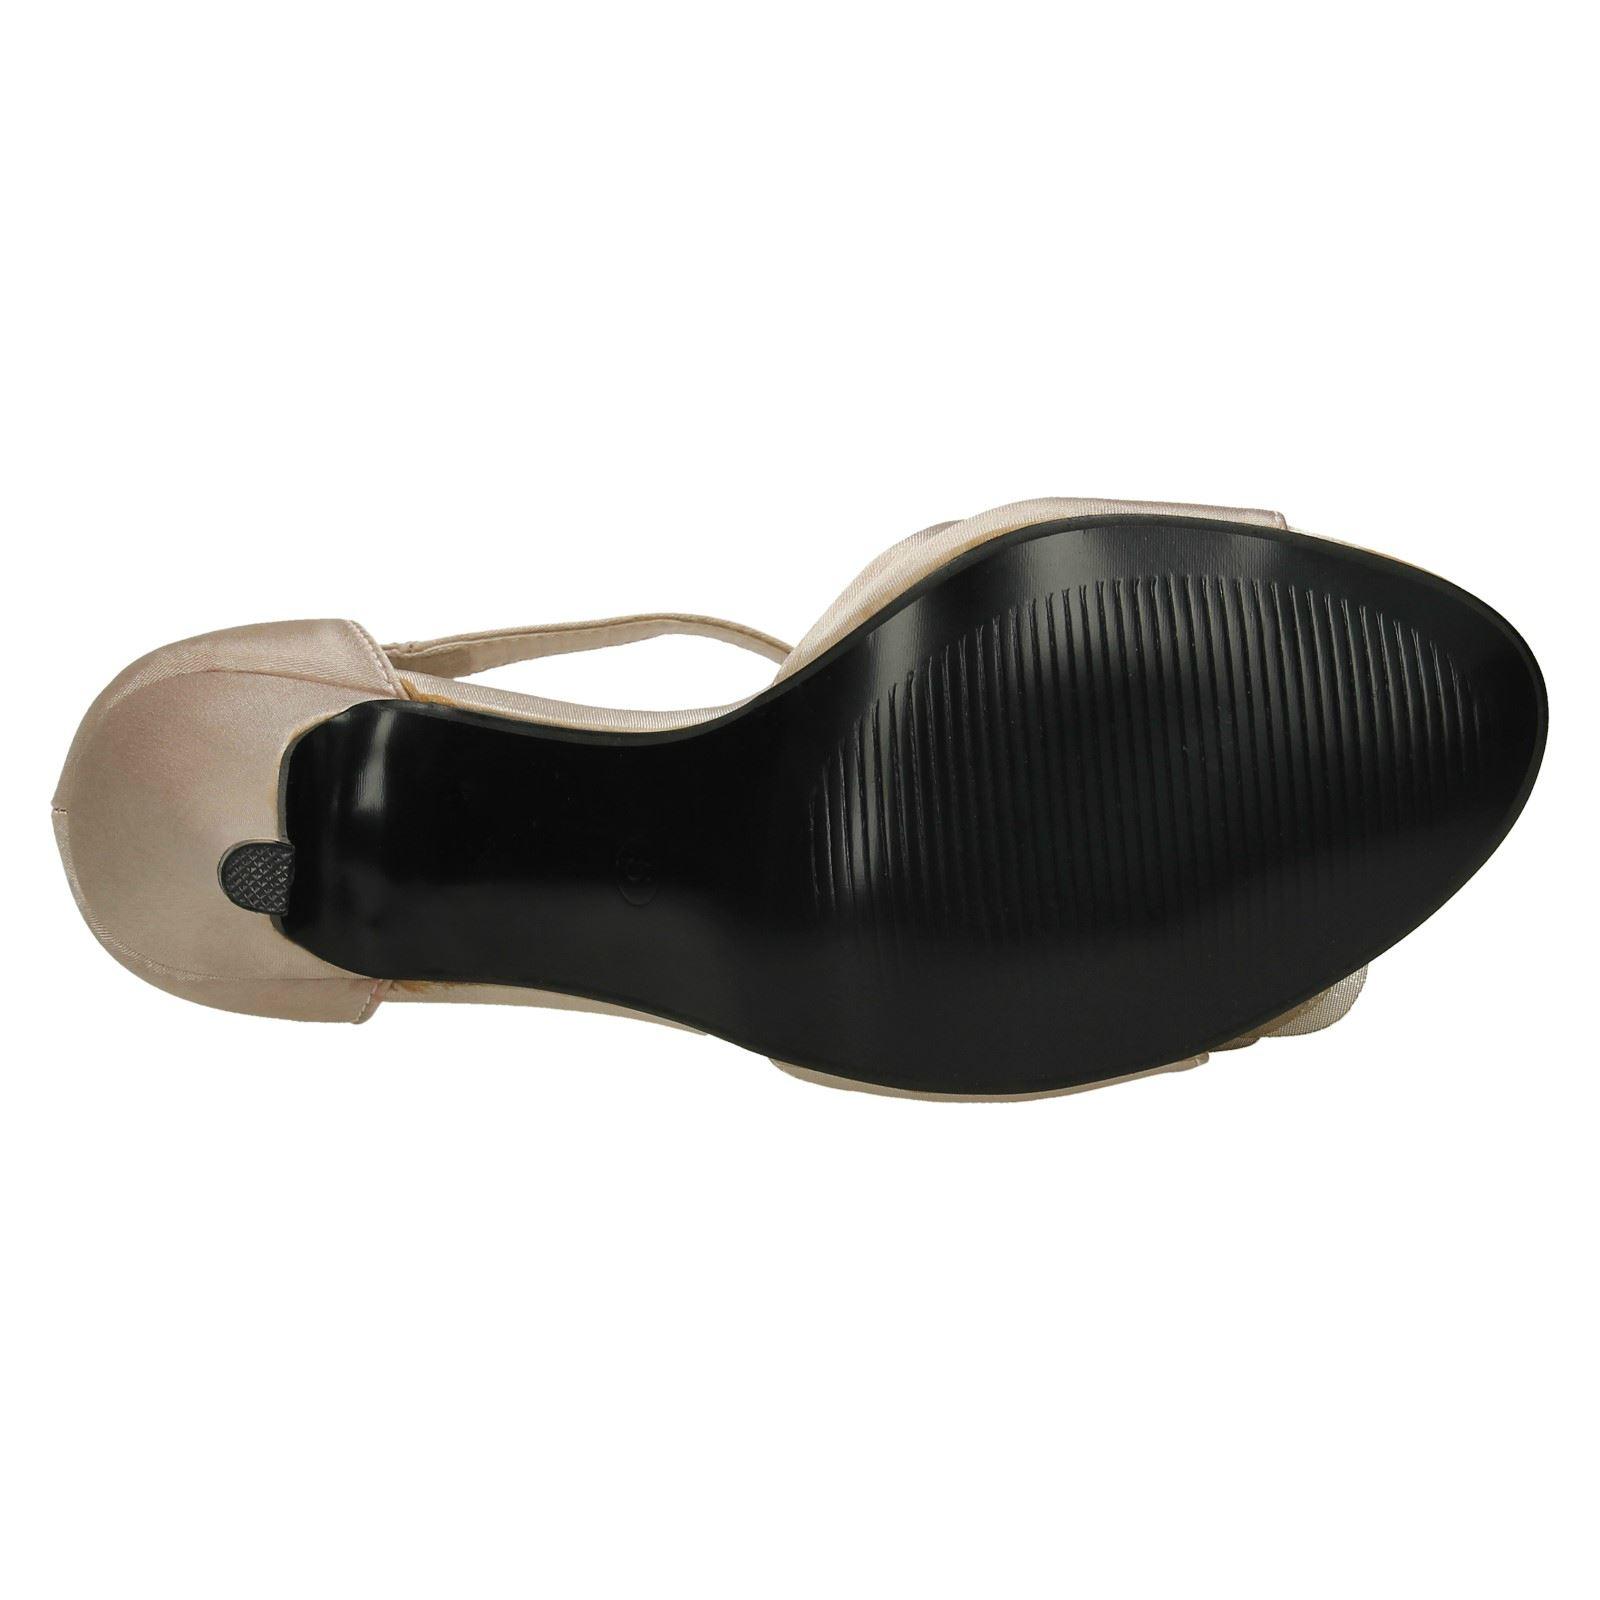 F1R740 Ladies Spot On/' High Heeled Ankle Strap Sandal